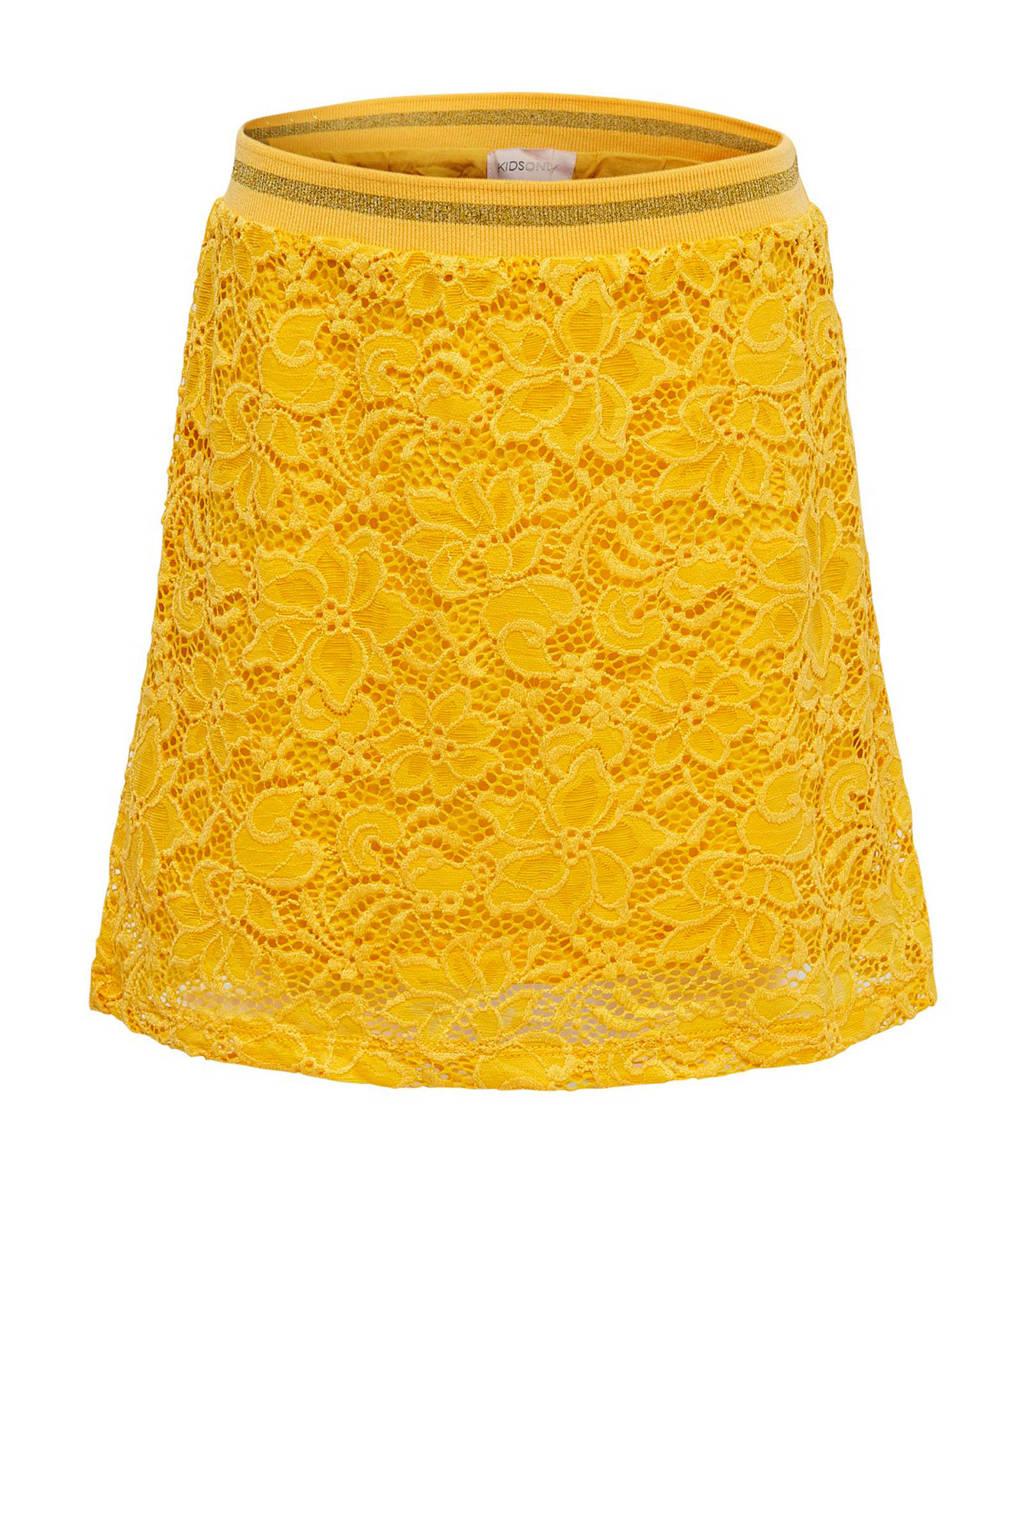 KIDSONLY kanten rok Amaze geel, Geel